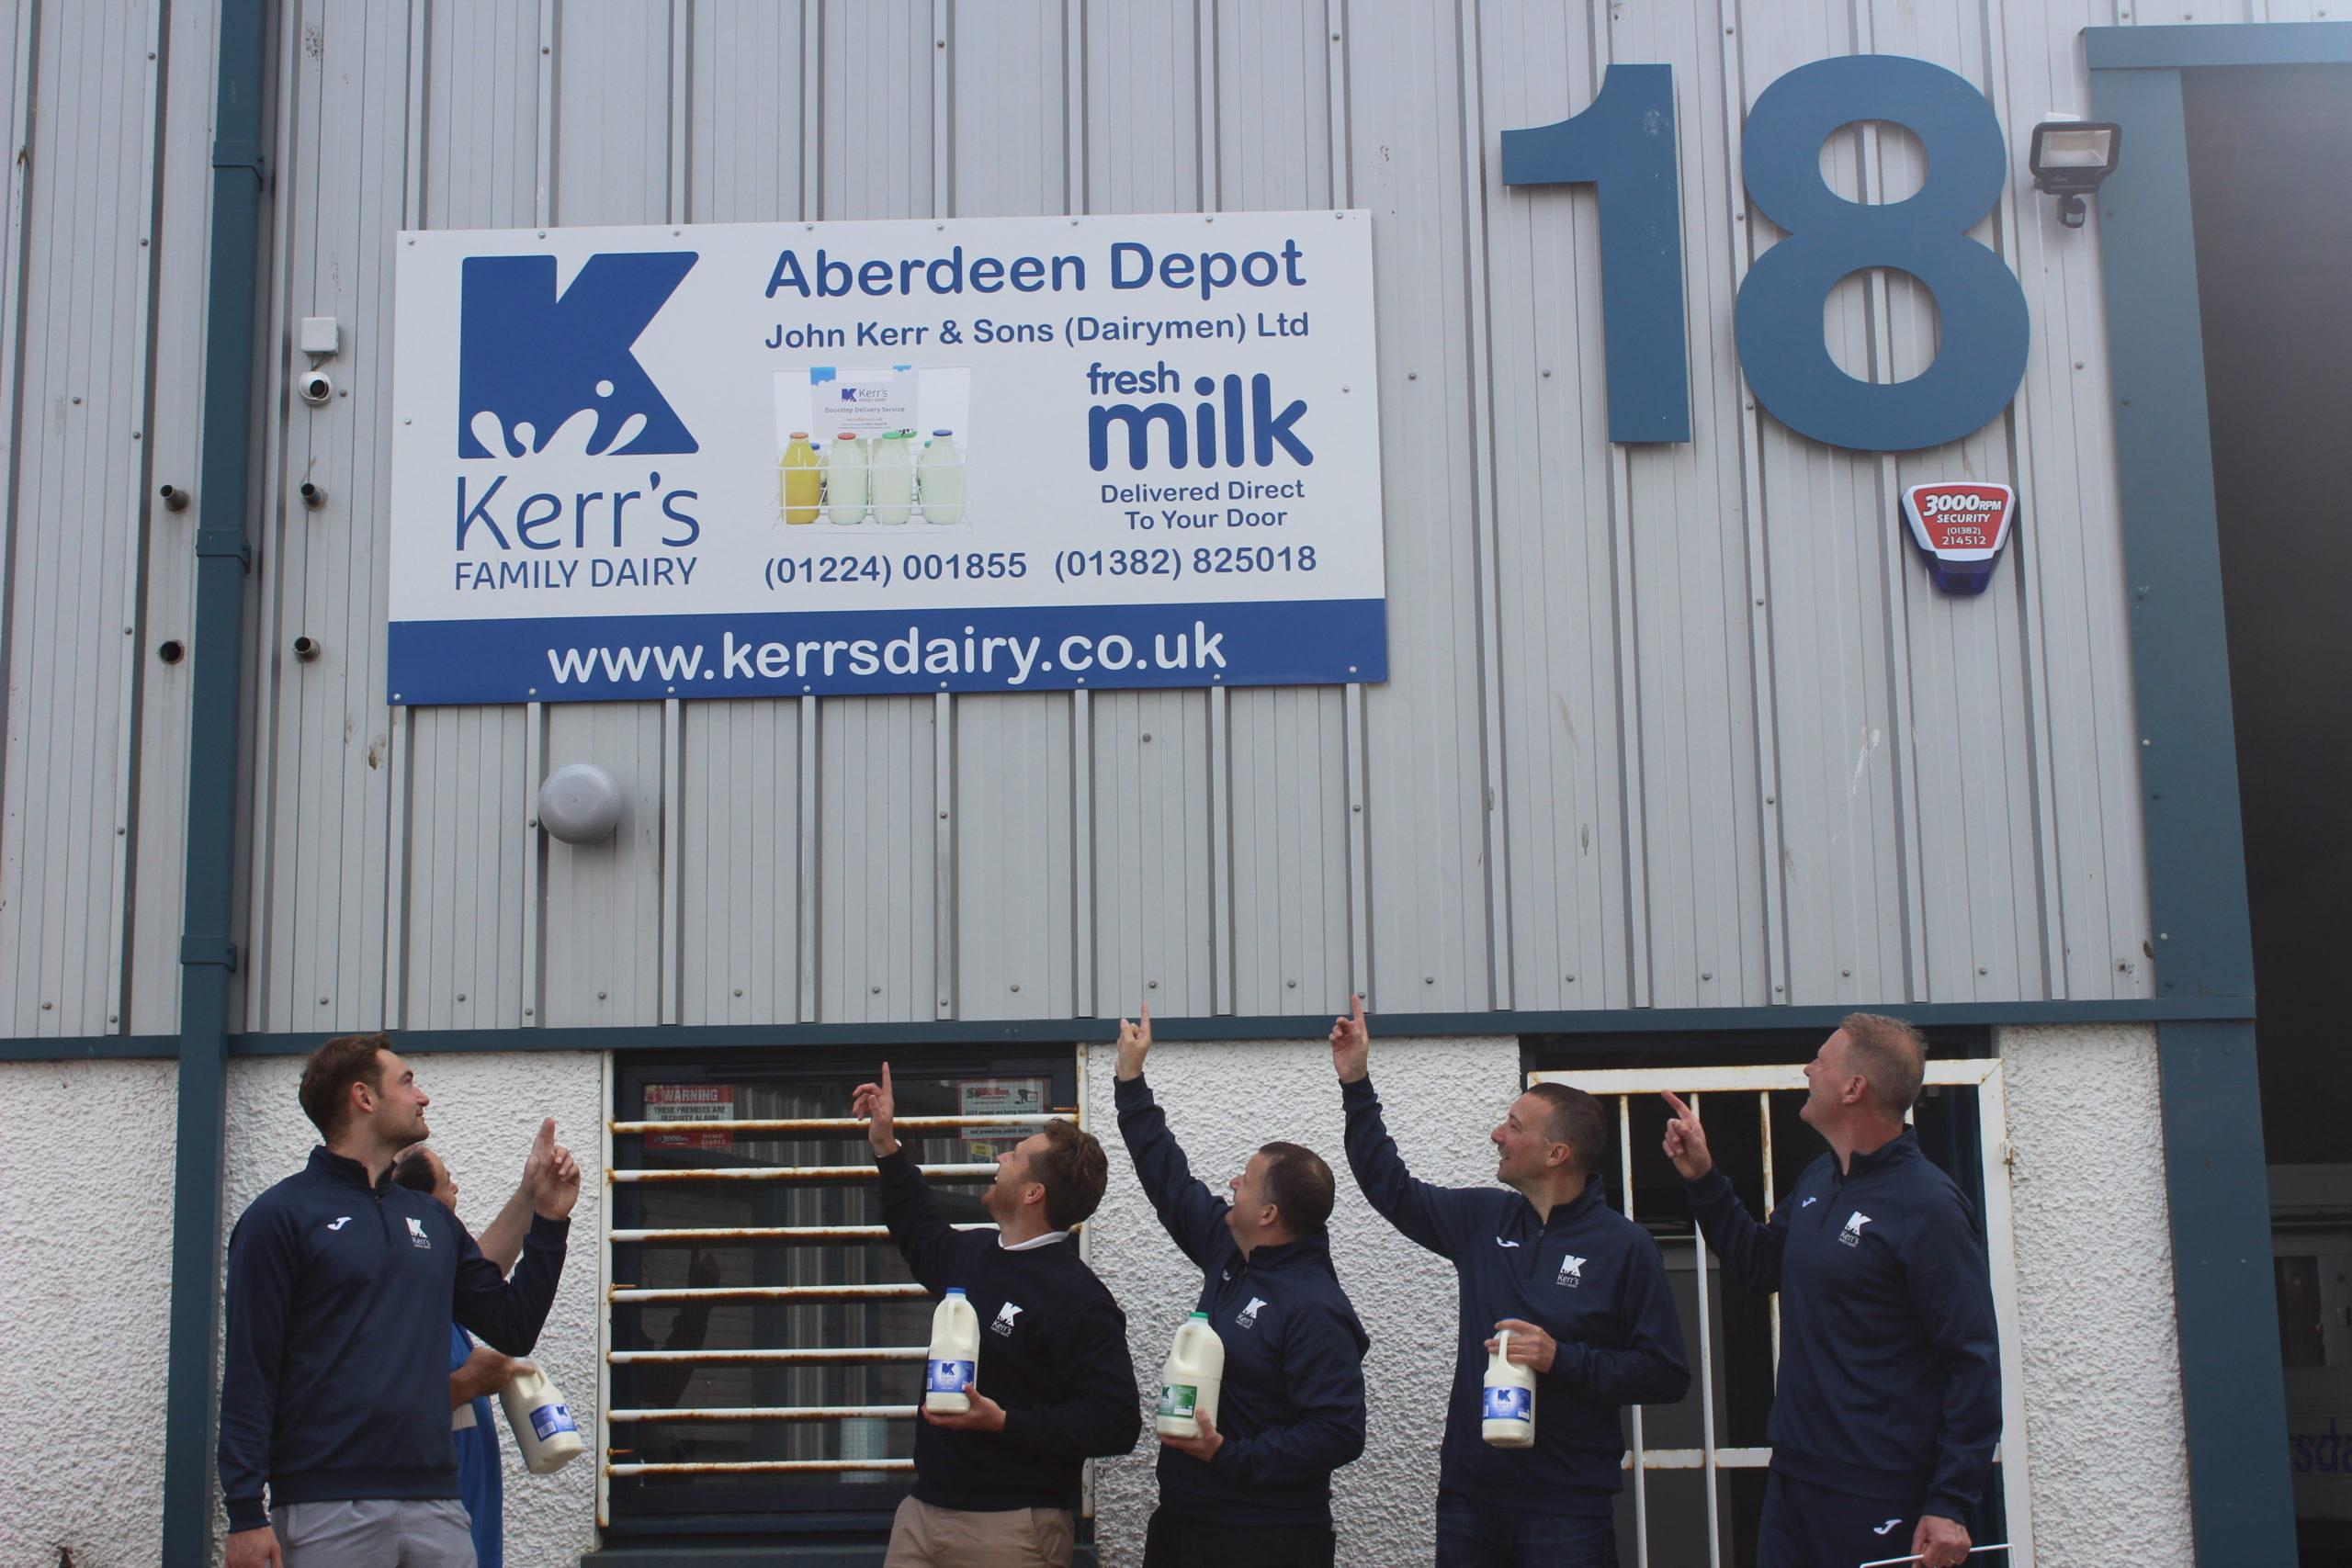 Kerr's Family Dairy